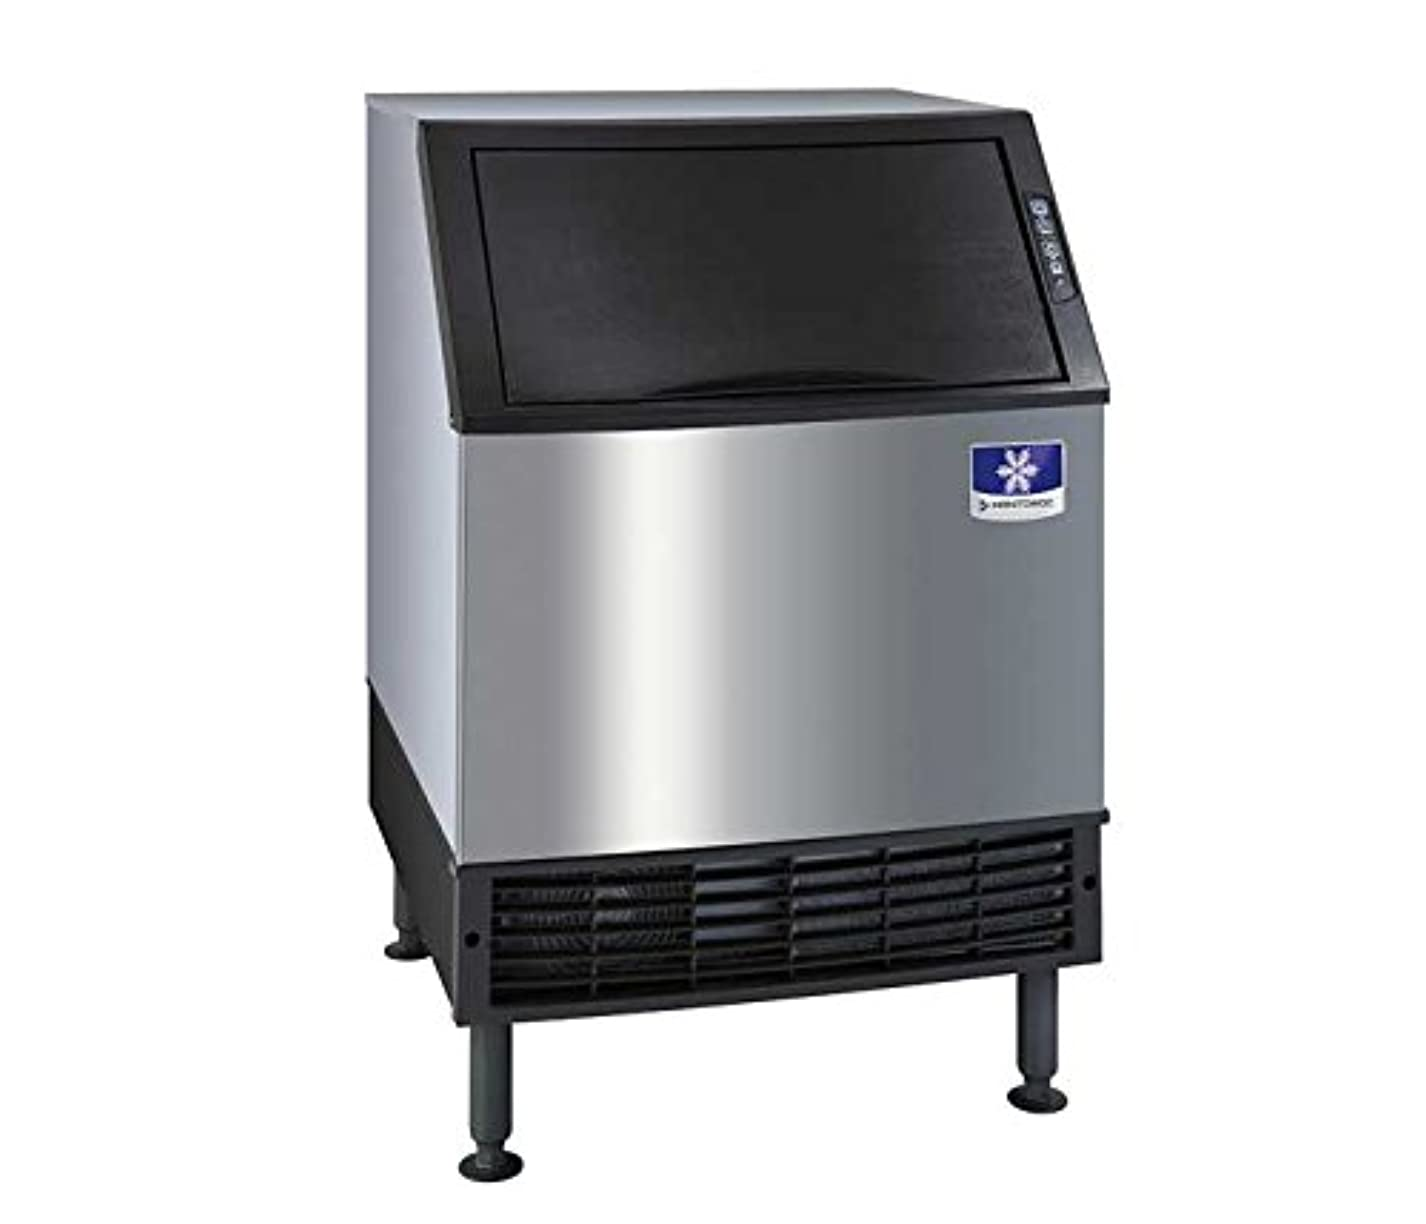 Manitowoc UDF0240A-161B NEO Undercounter Ice Machine wvx166985735795